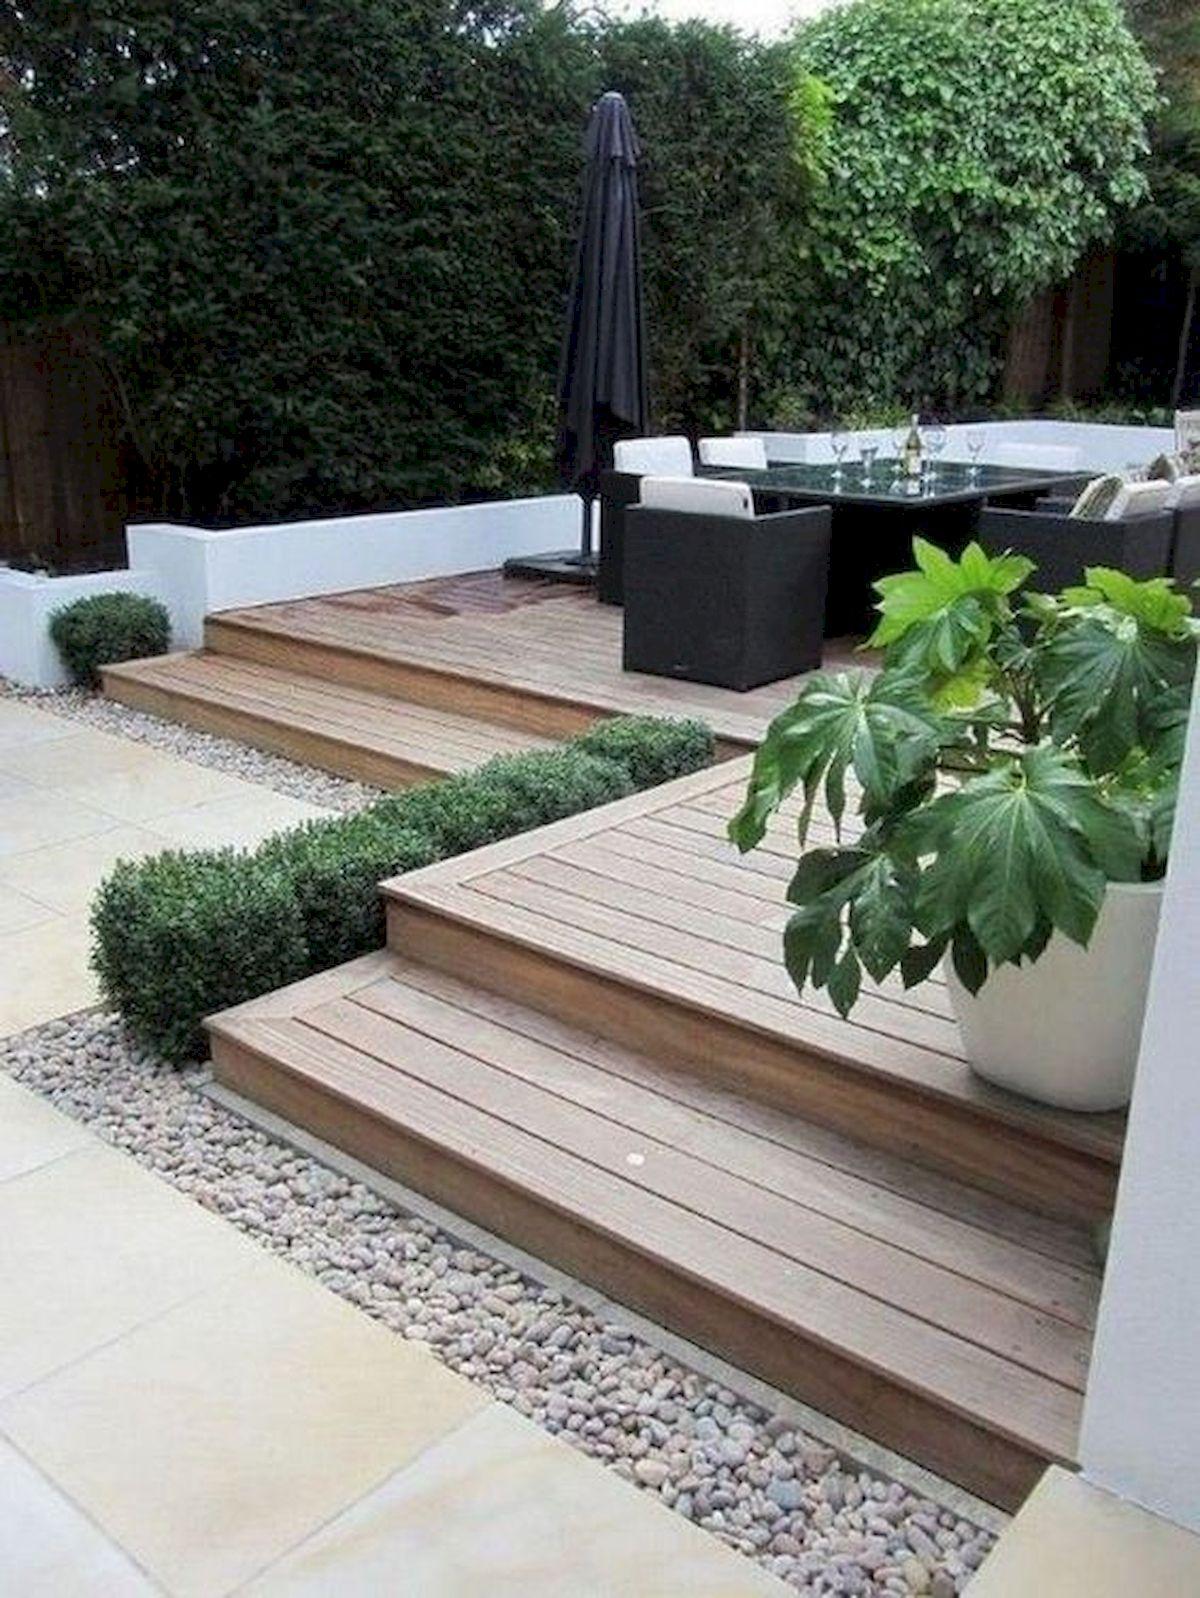 50 Best DIY Backyard Patio And Decking Design Ideas (3)